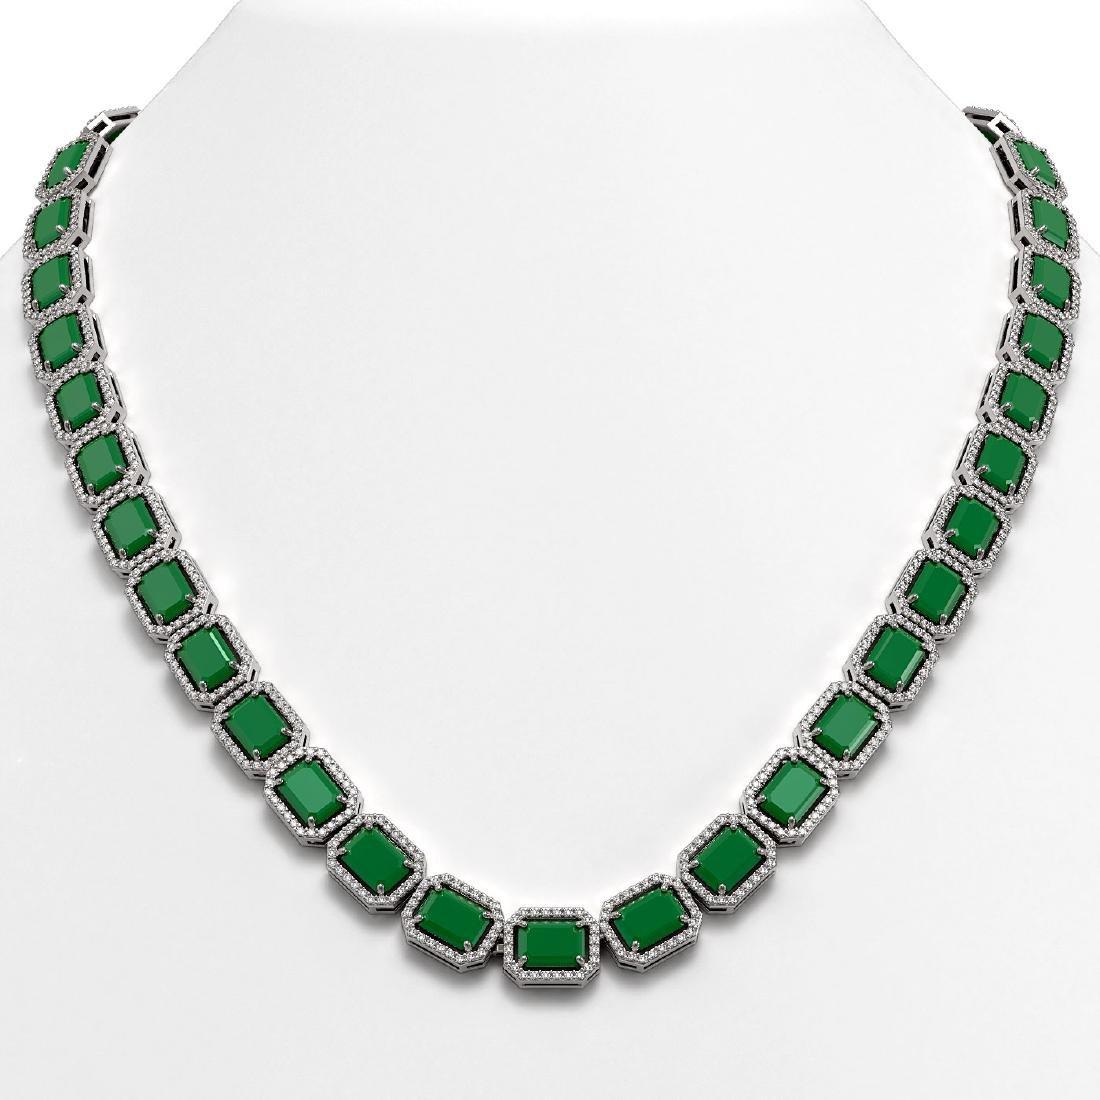 58.59 CTW Emerald & Diamond Halo Necklace 10K White